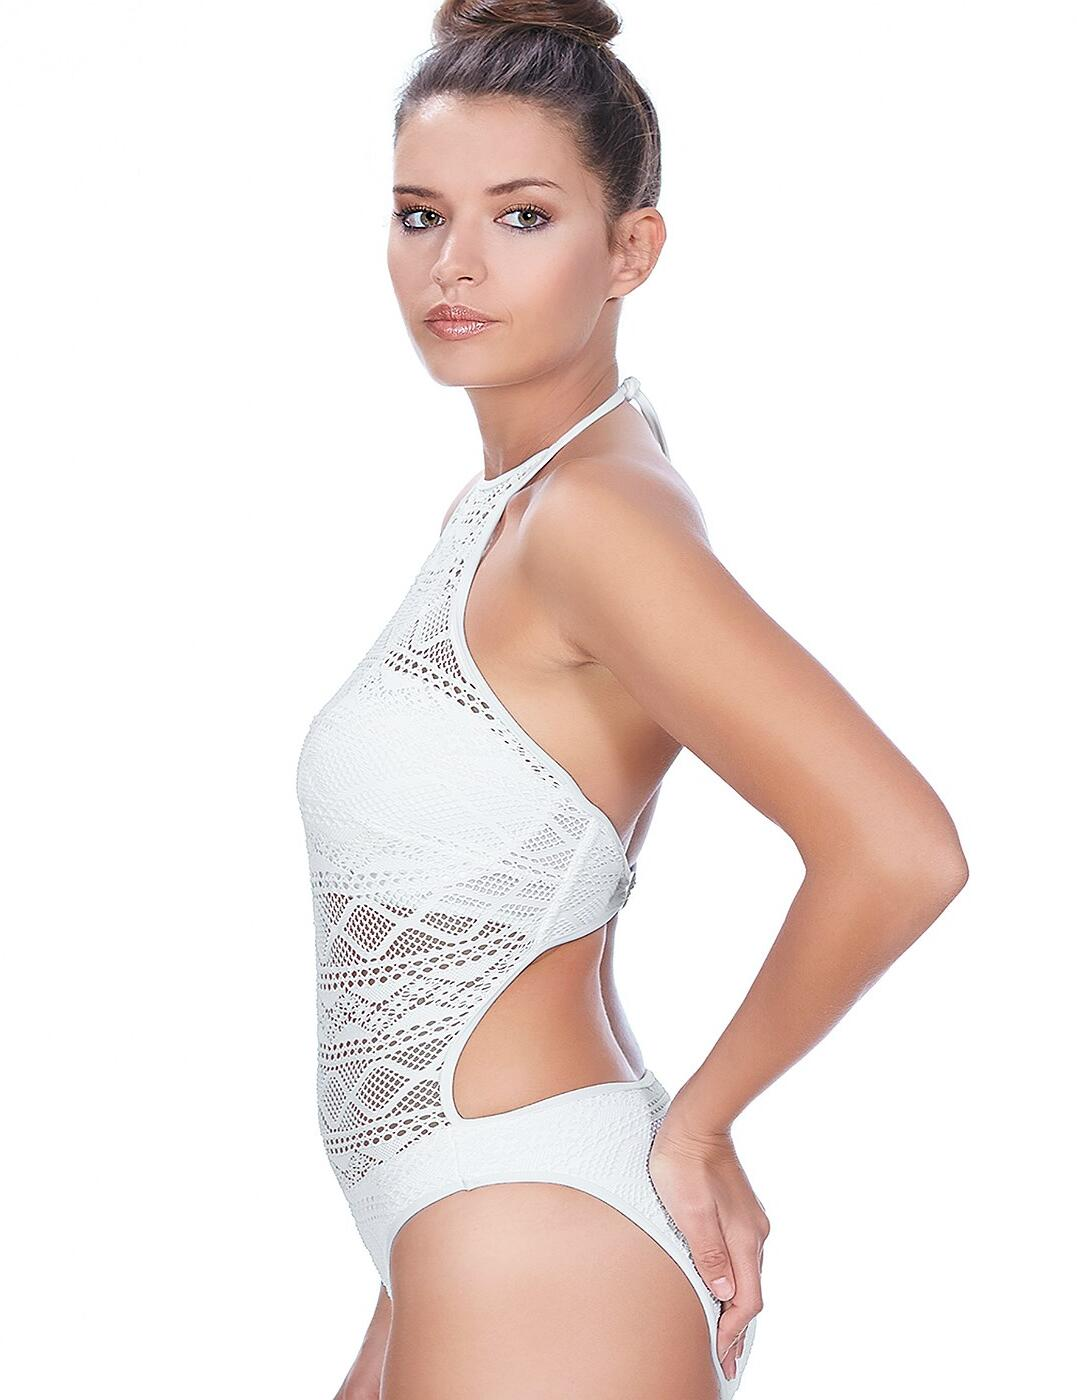 c87ef9e9d8c4f Freya Sundance 3974 Underwired High Neck Swimsuit Swimming Costume ...